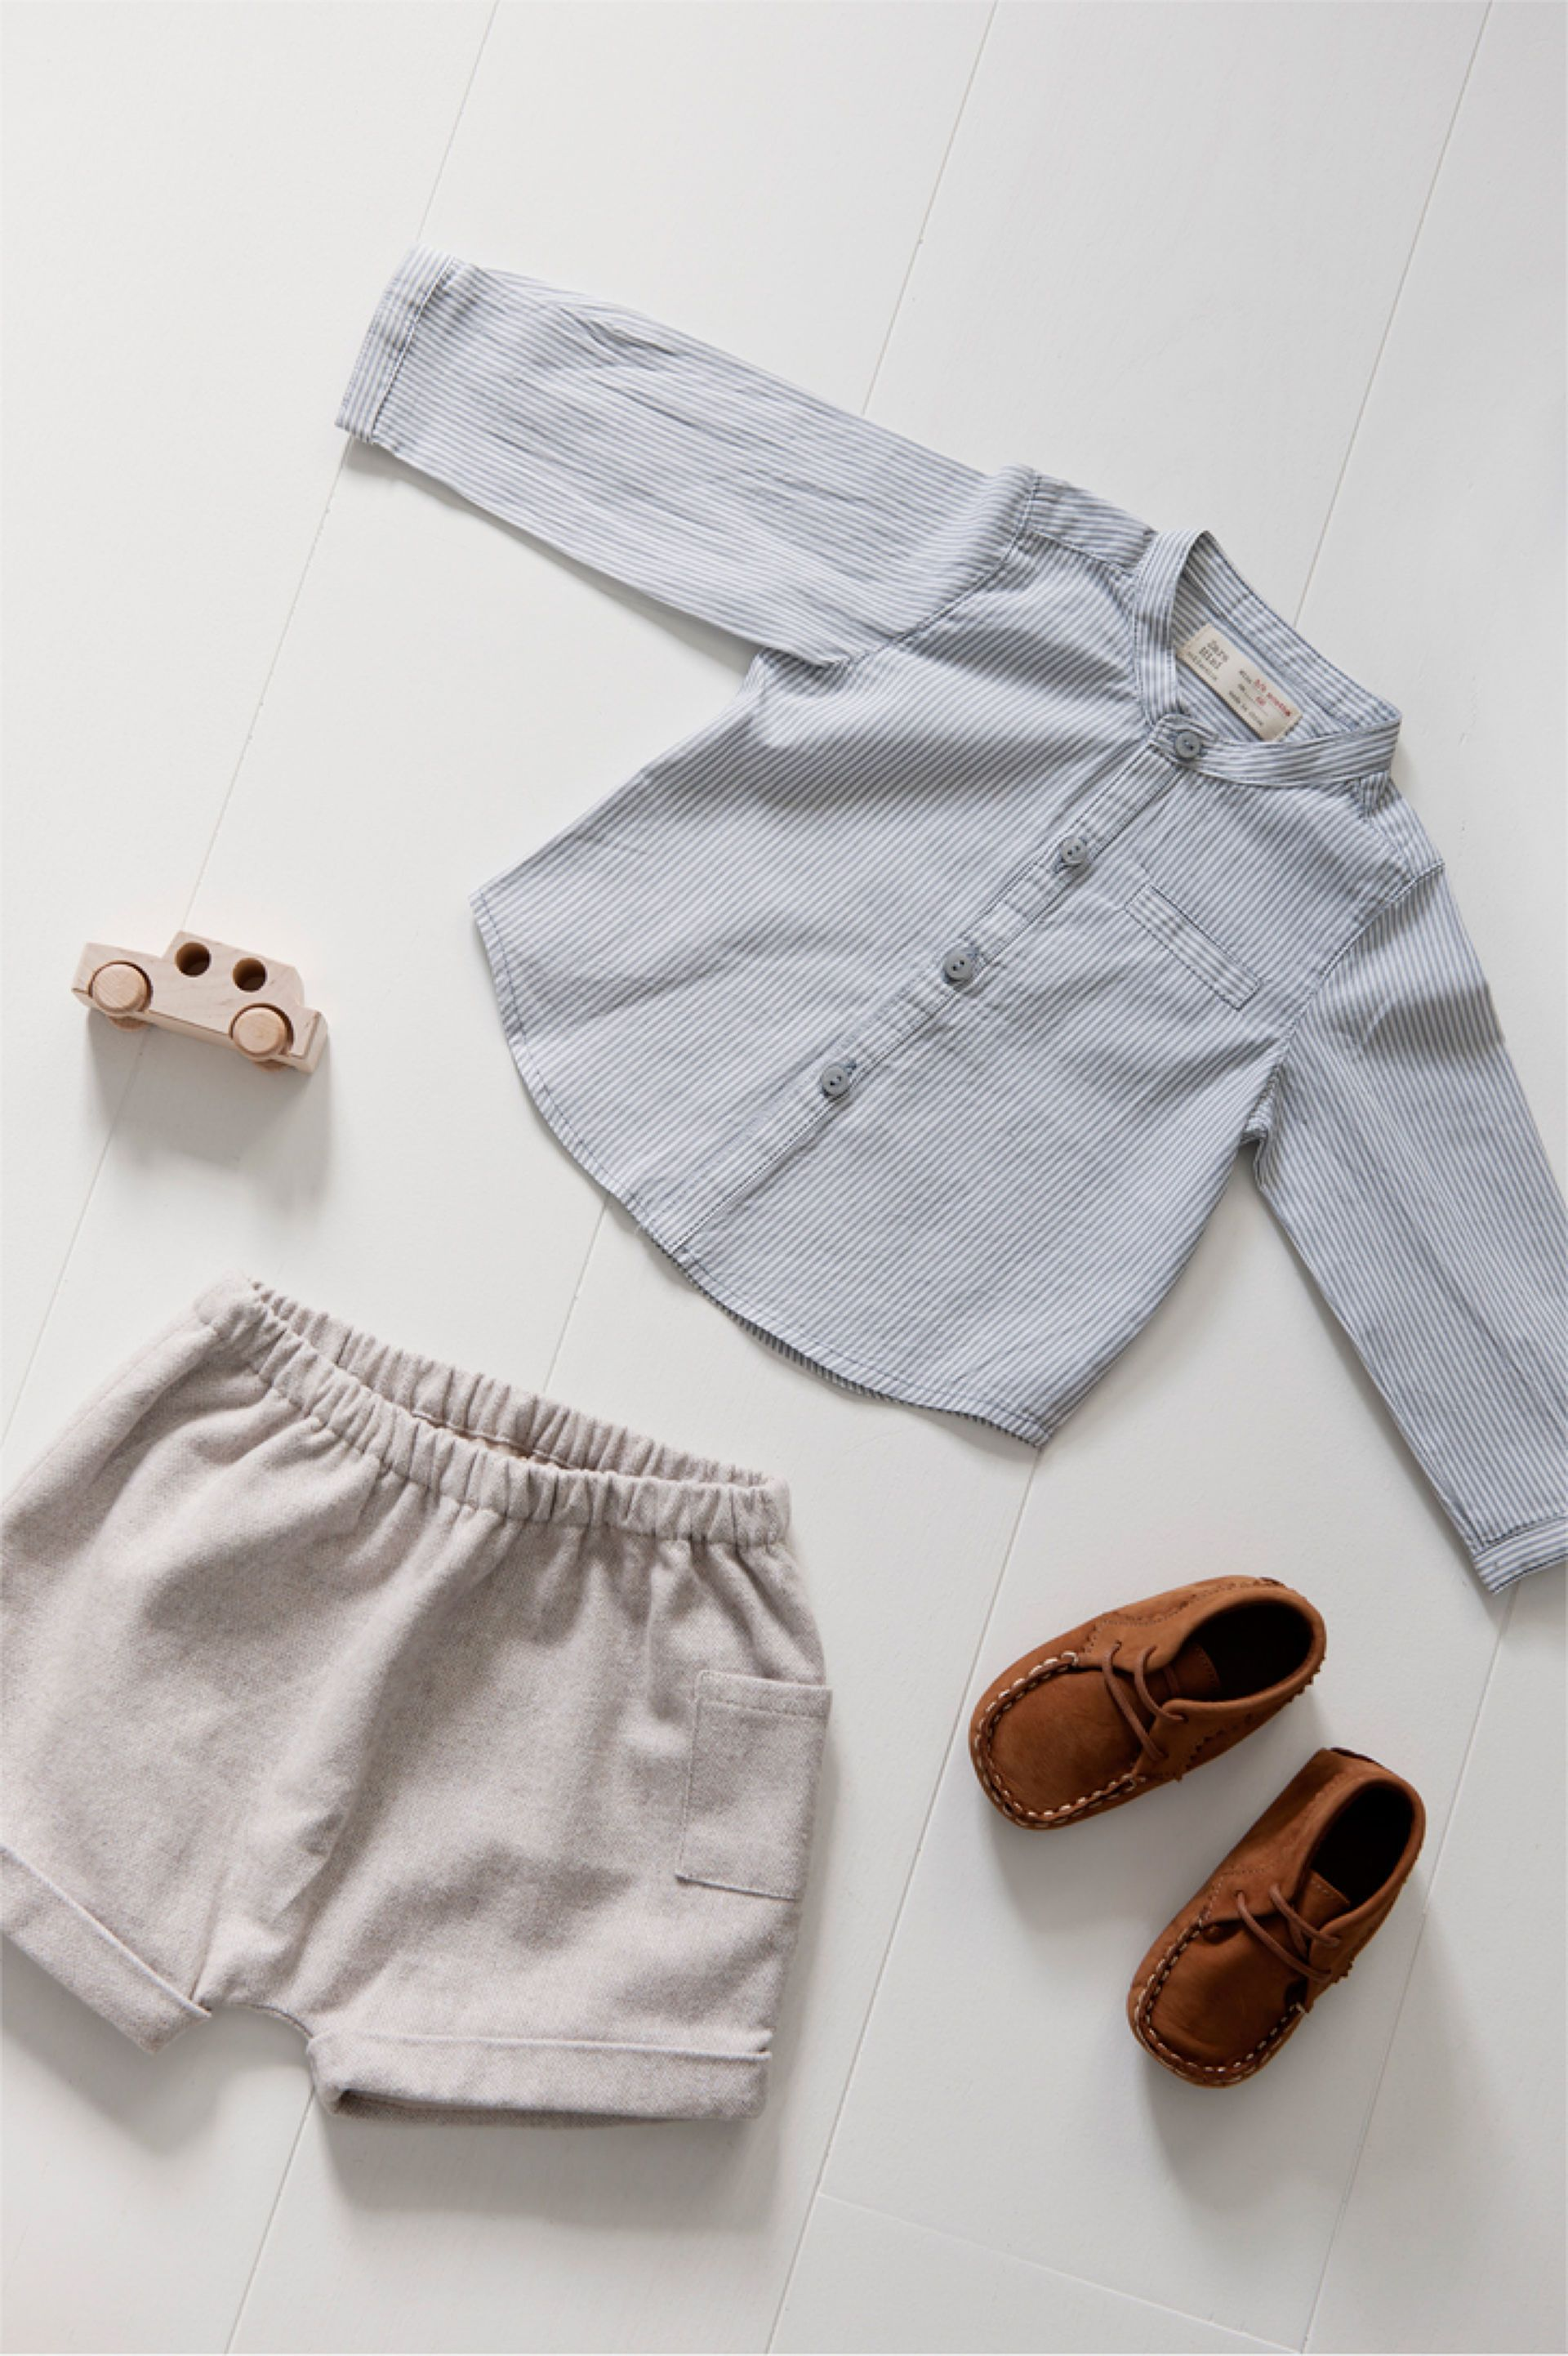 Zara Kinderkleding.Augustus September Mini Lookbook Zara Nederland Clothes For